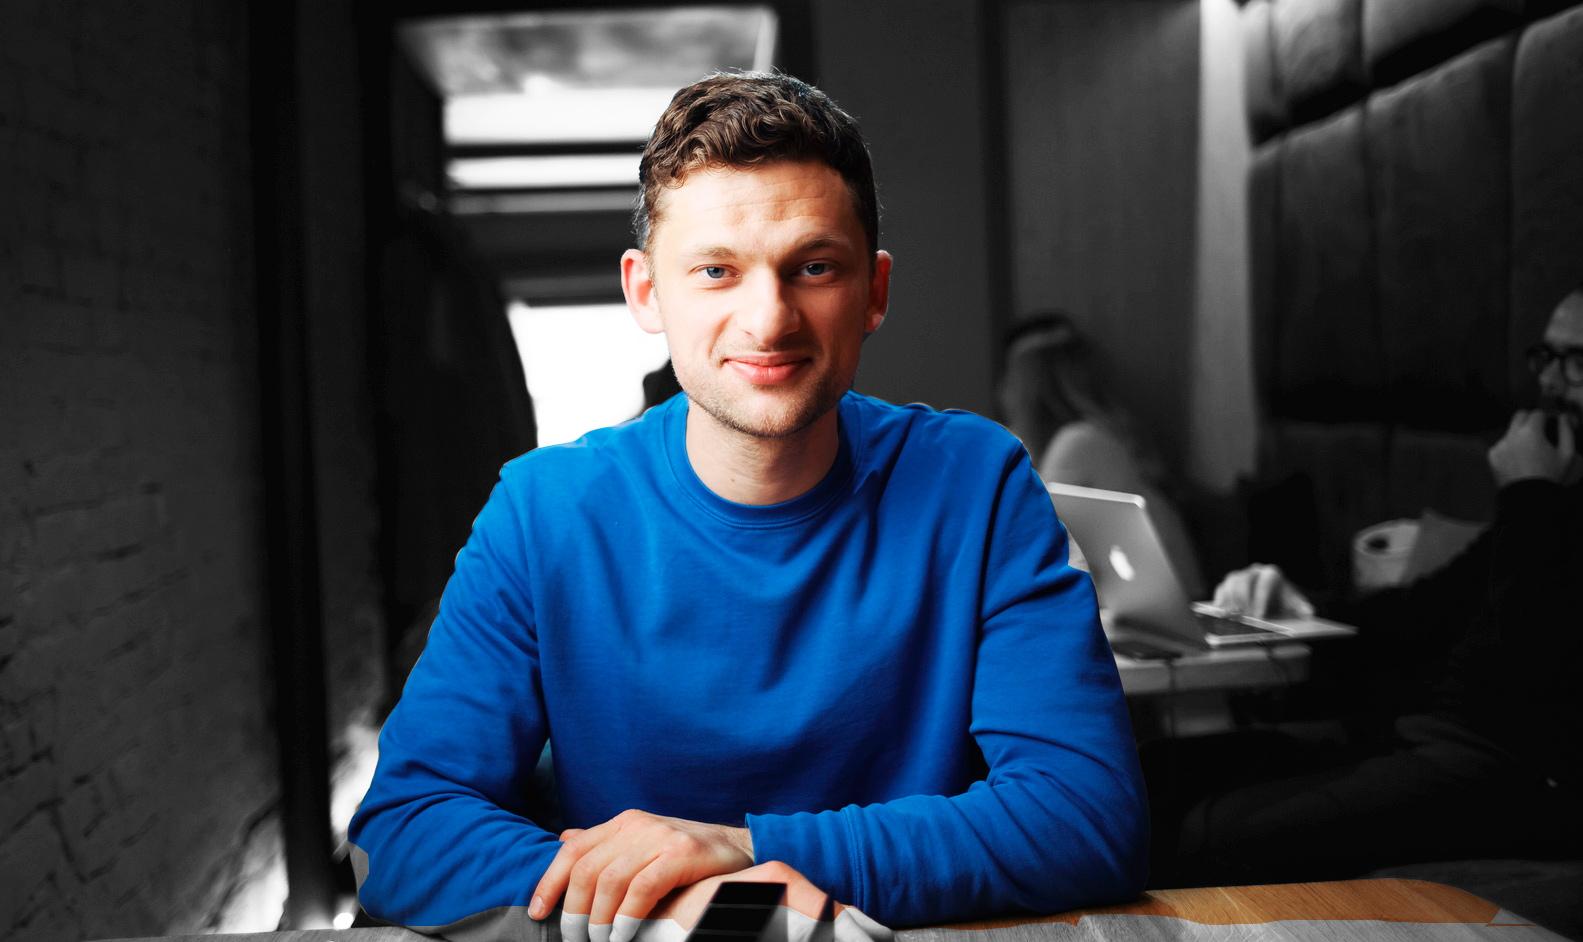 Дмитрий Дубилет холостяк, соучредитель интернет-банка Monobank